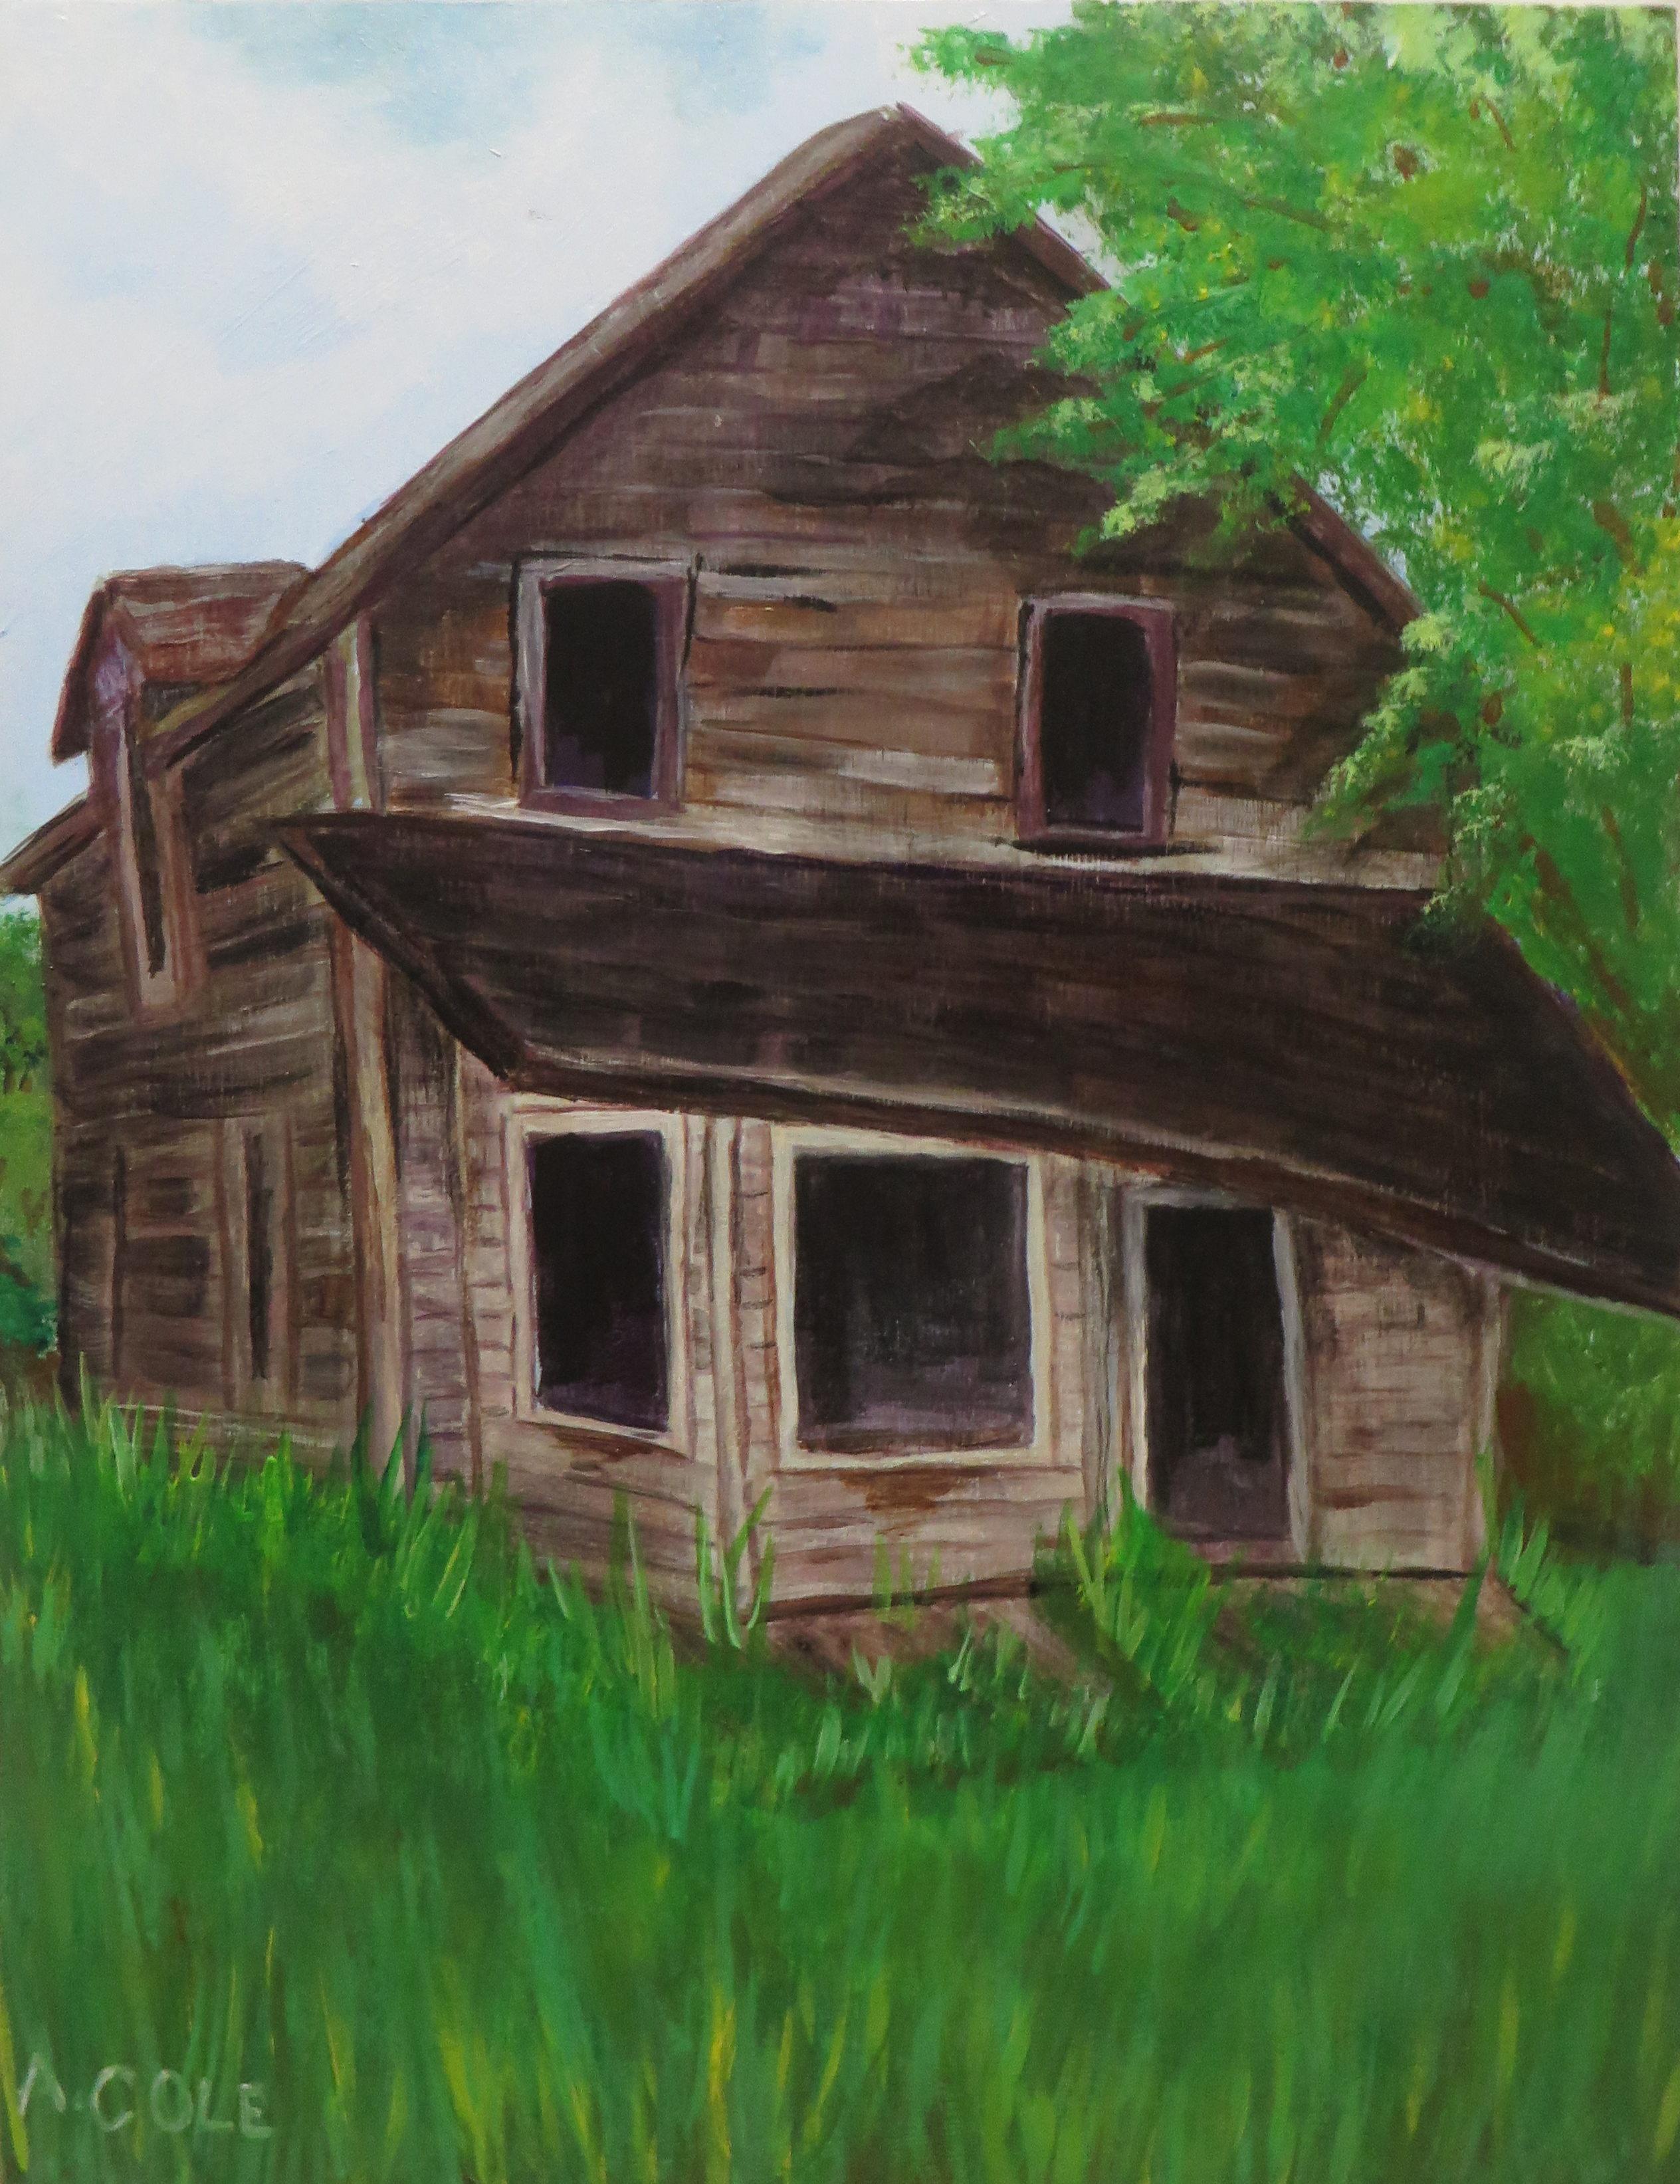 The Daigle House